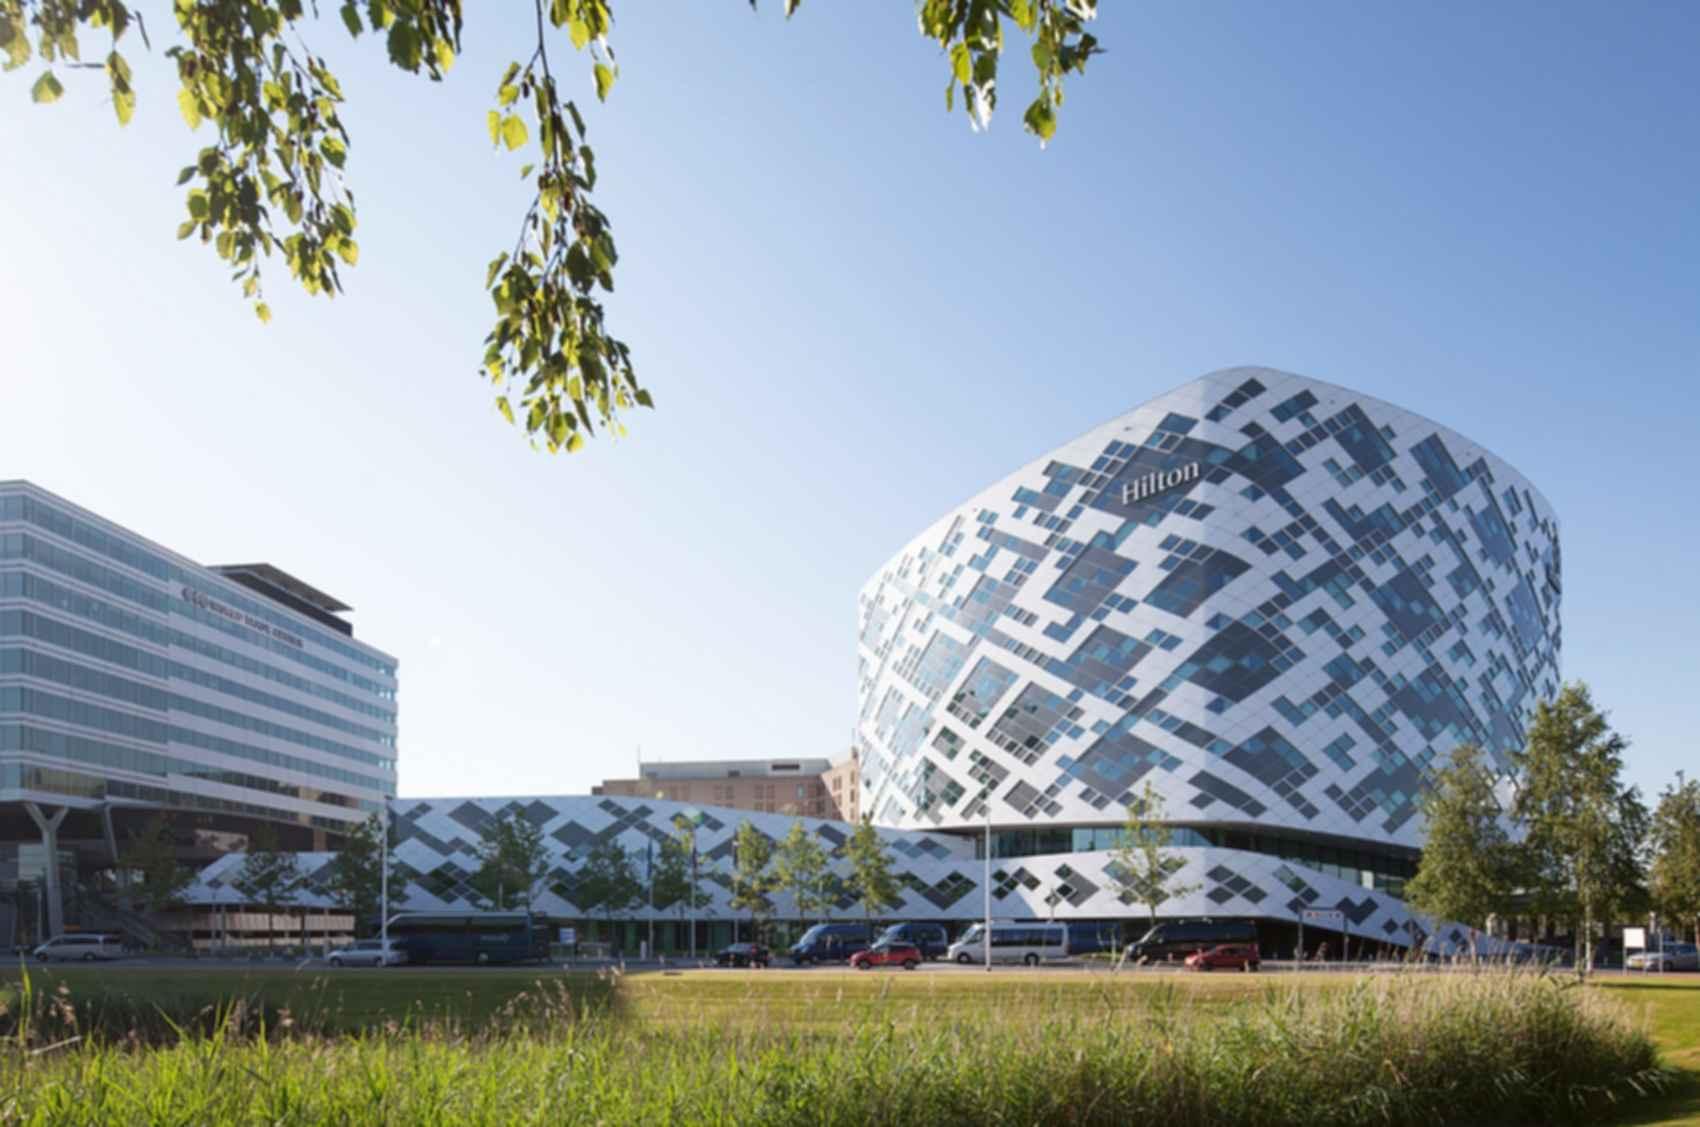 Hilton Amsterdam Airport Schiphol - Façade